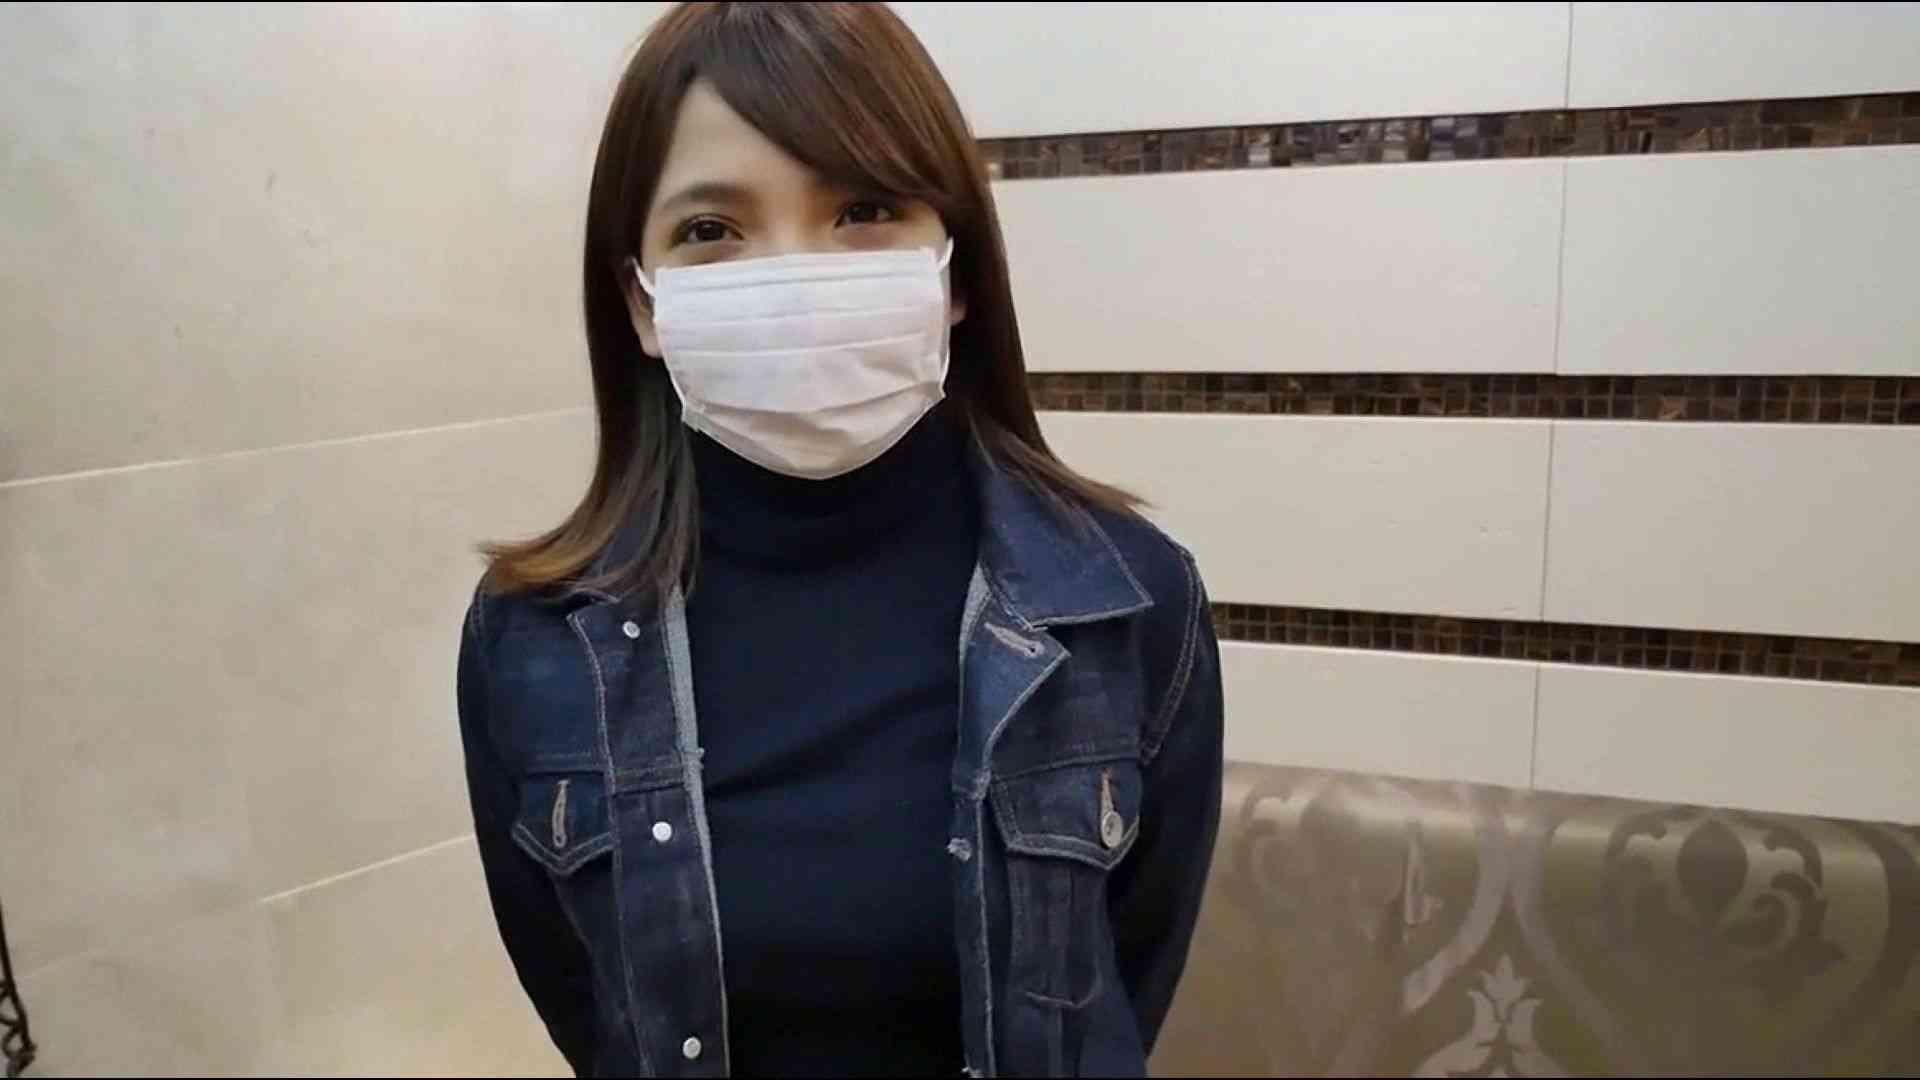 S級厳選美女ビッチガールVol.41 前編 モデル | 美女丸裸  99pic 4